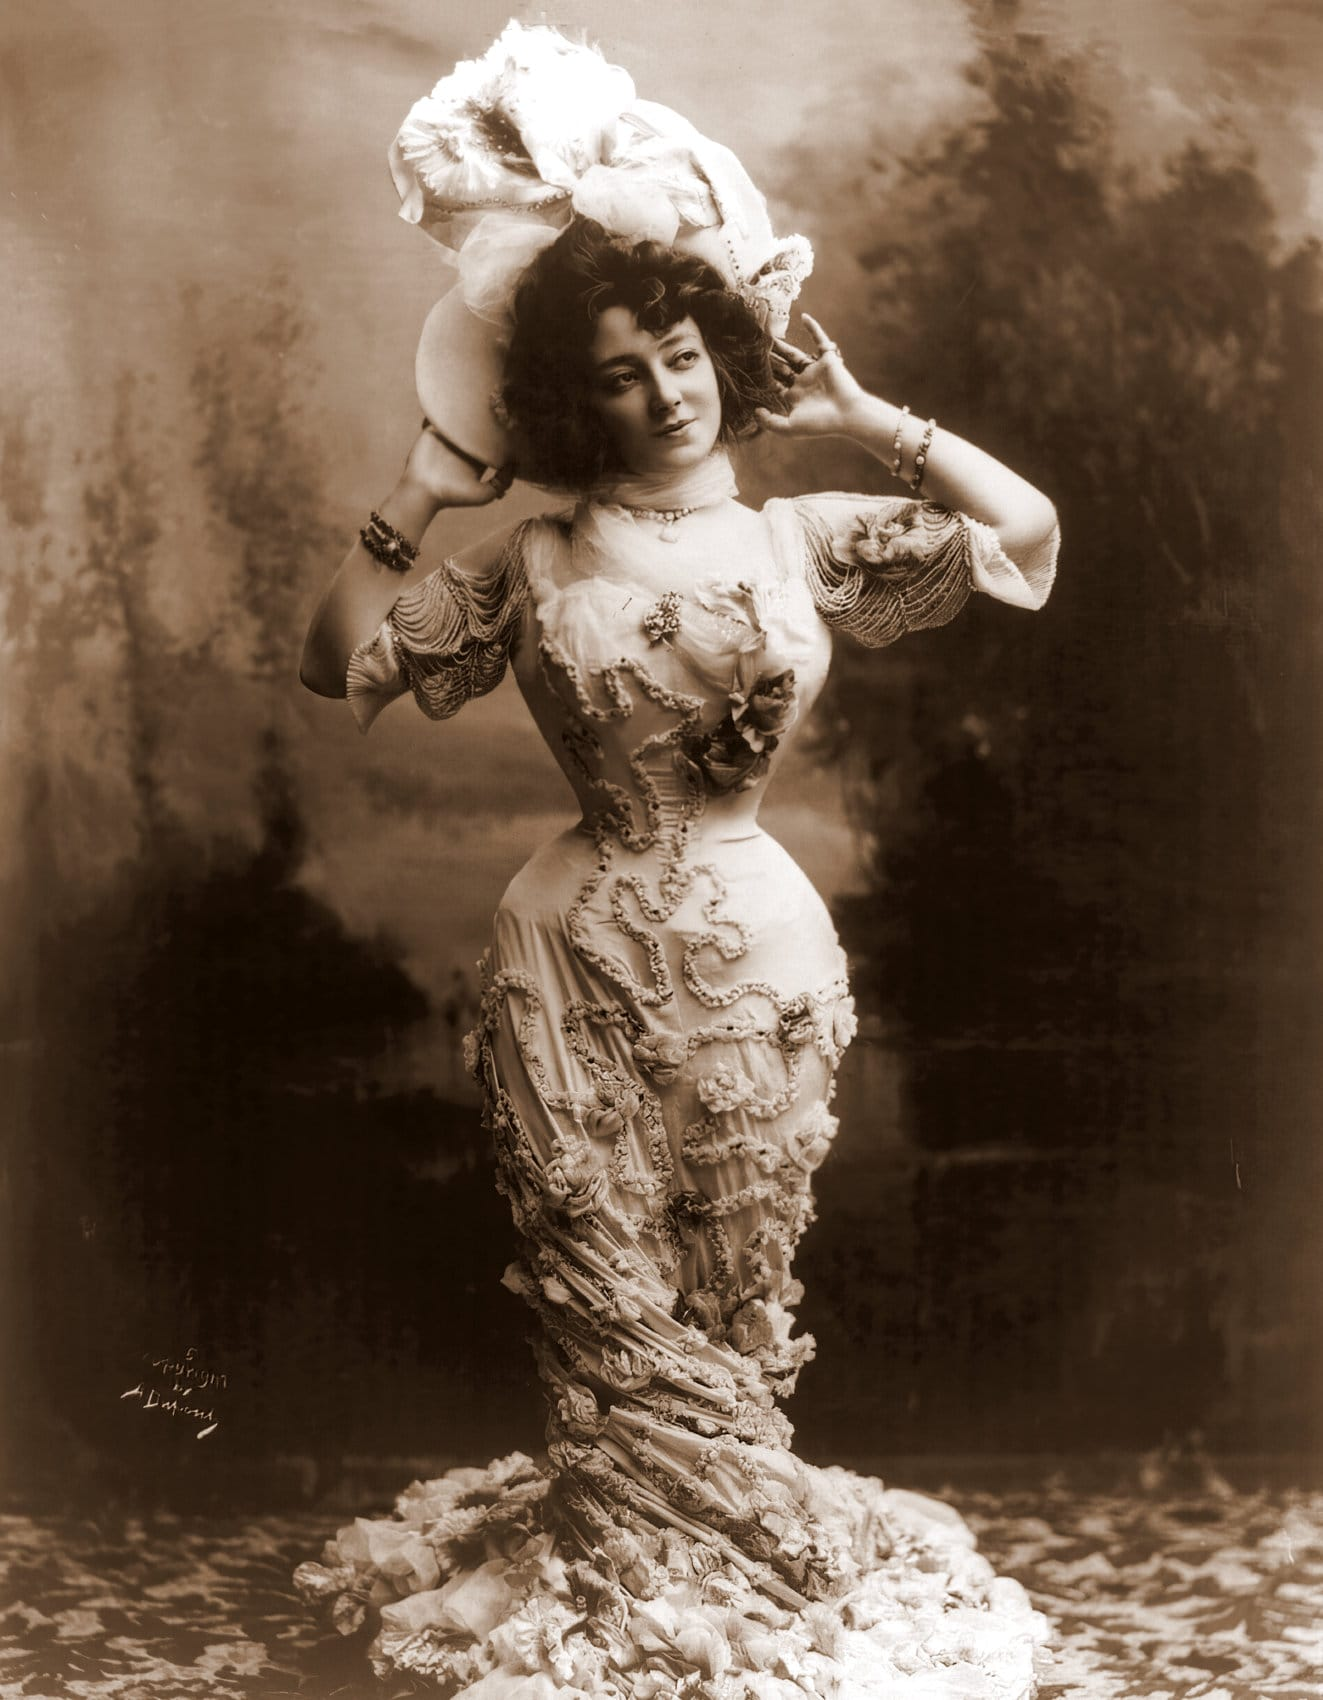 Victorian actress Anna Held - small waist